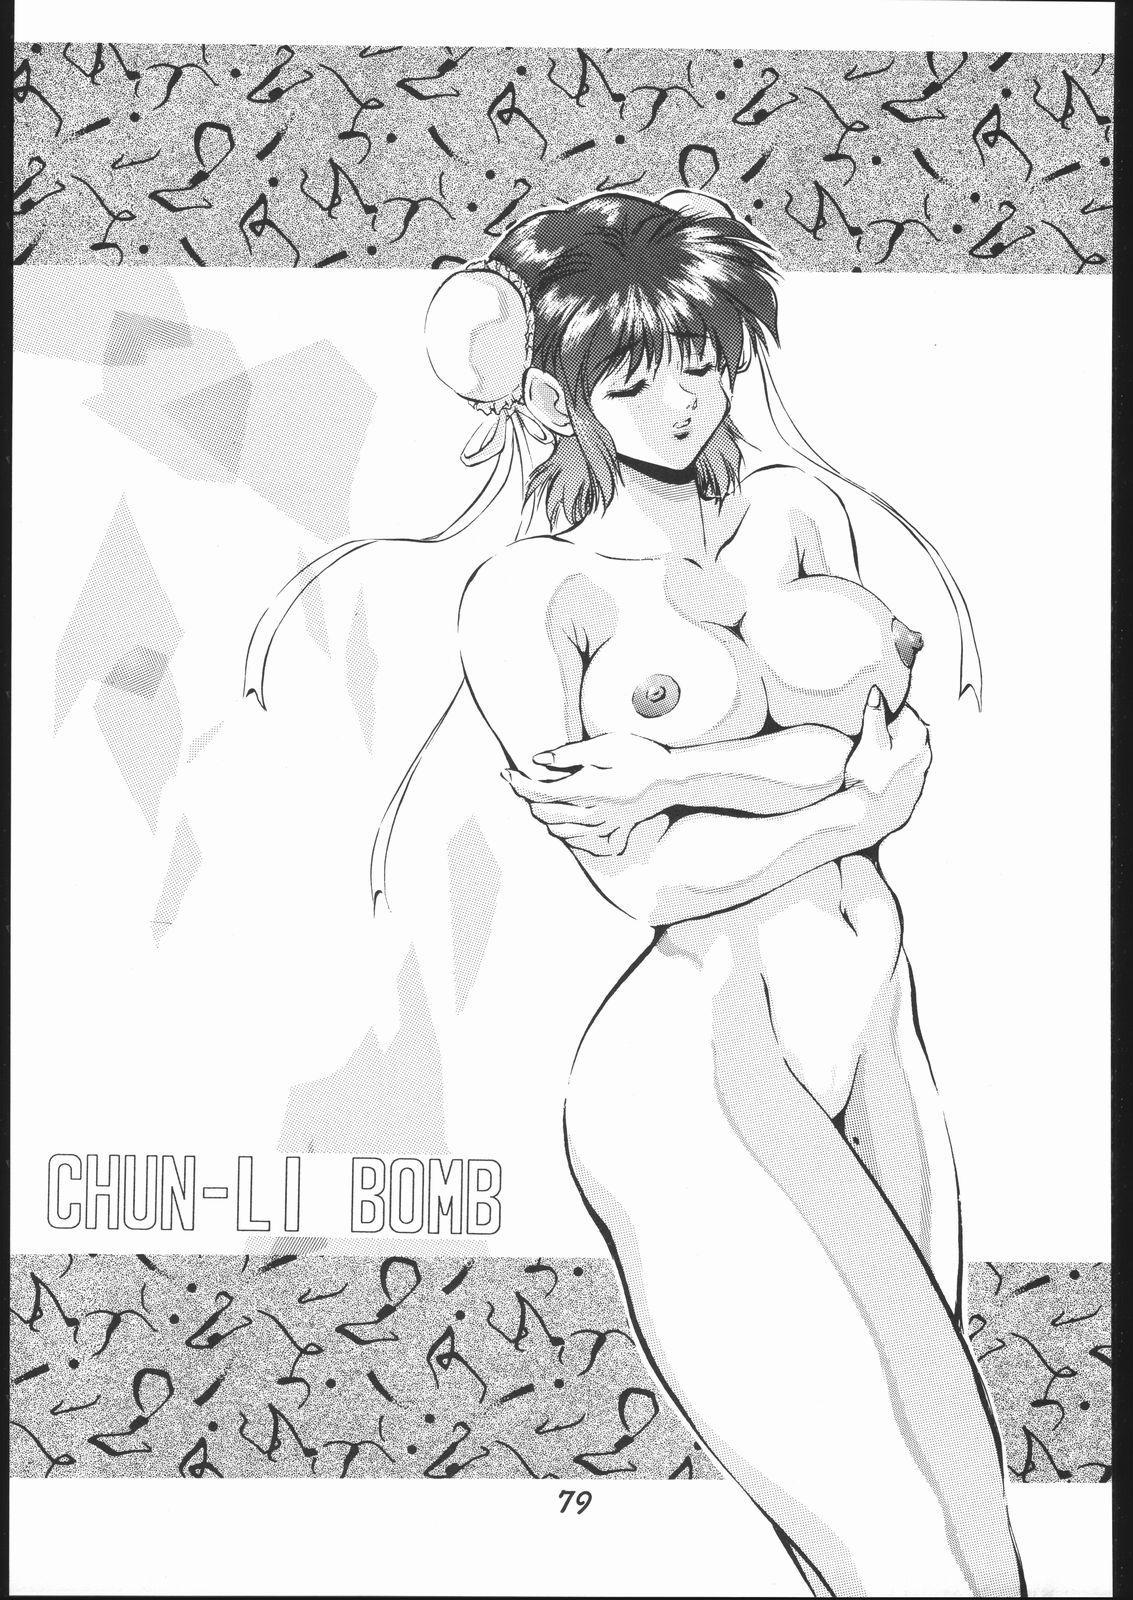 Chun-Li Side A 79